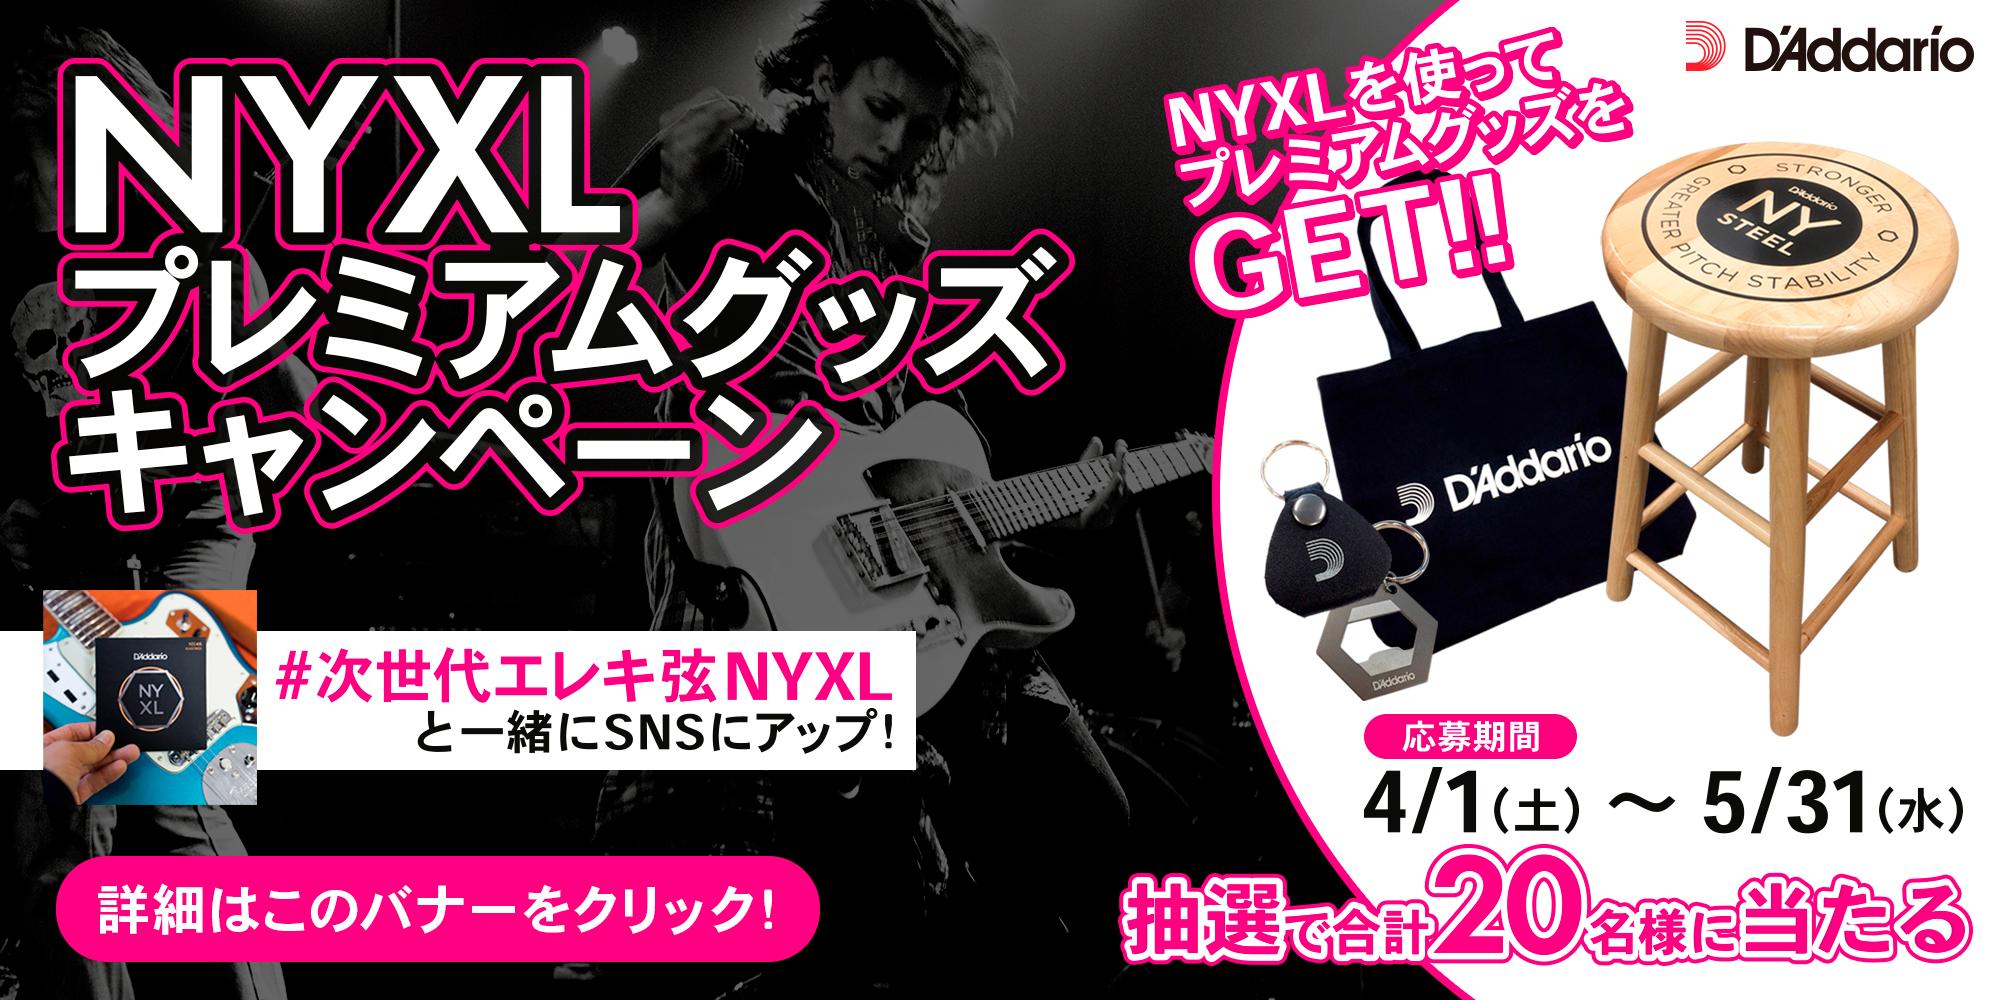 D'Addario 次世代エレキ弦 「NYXL」 プレミアム・グッズキャンペーン終了のお知らせ